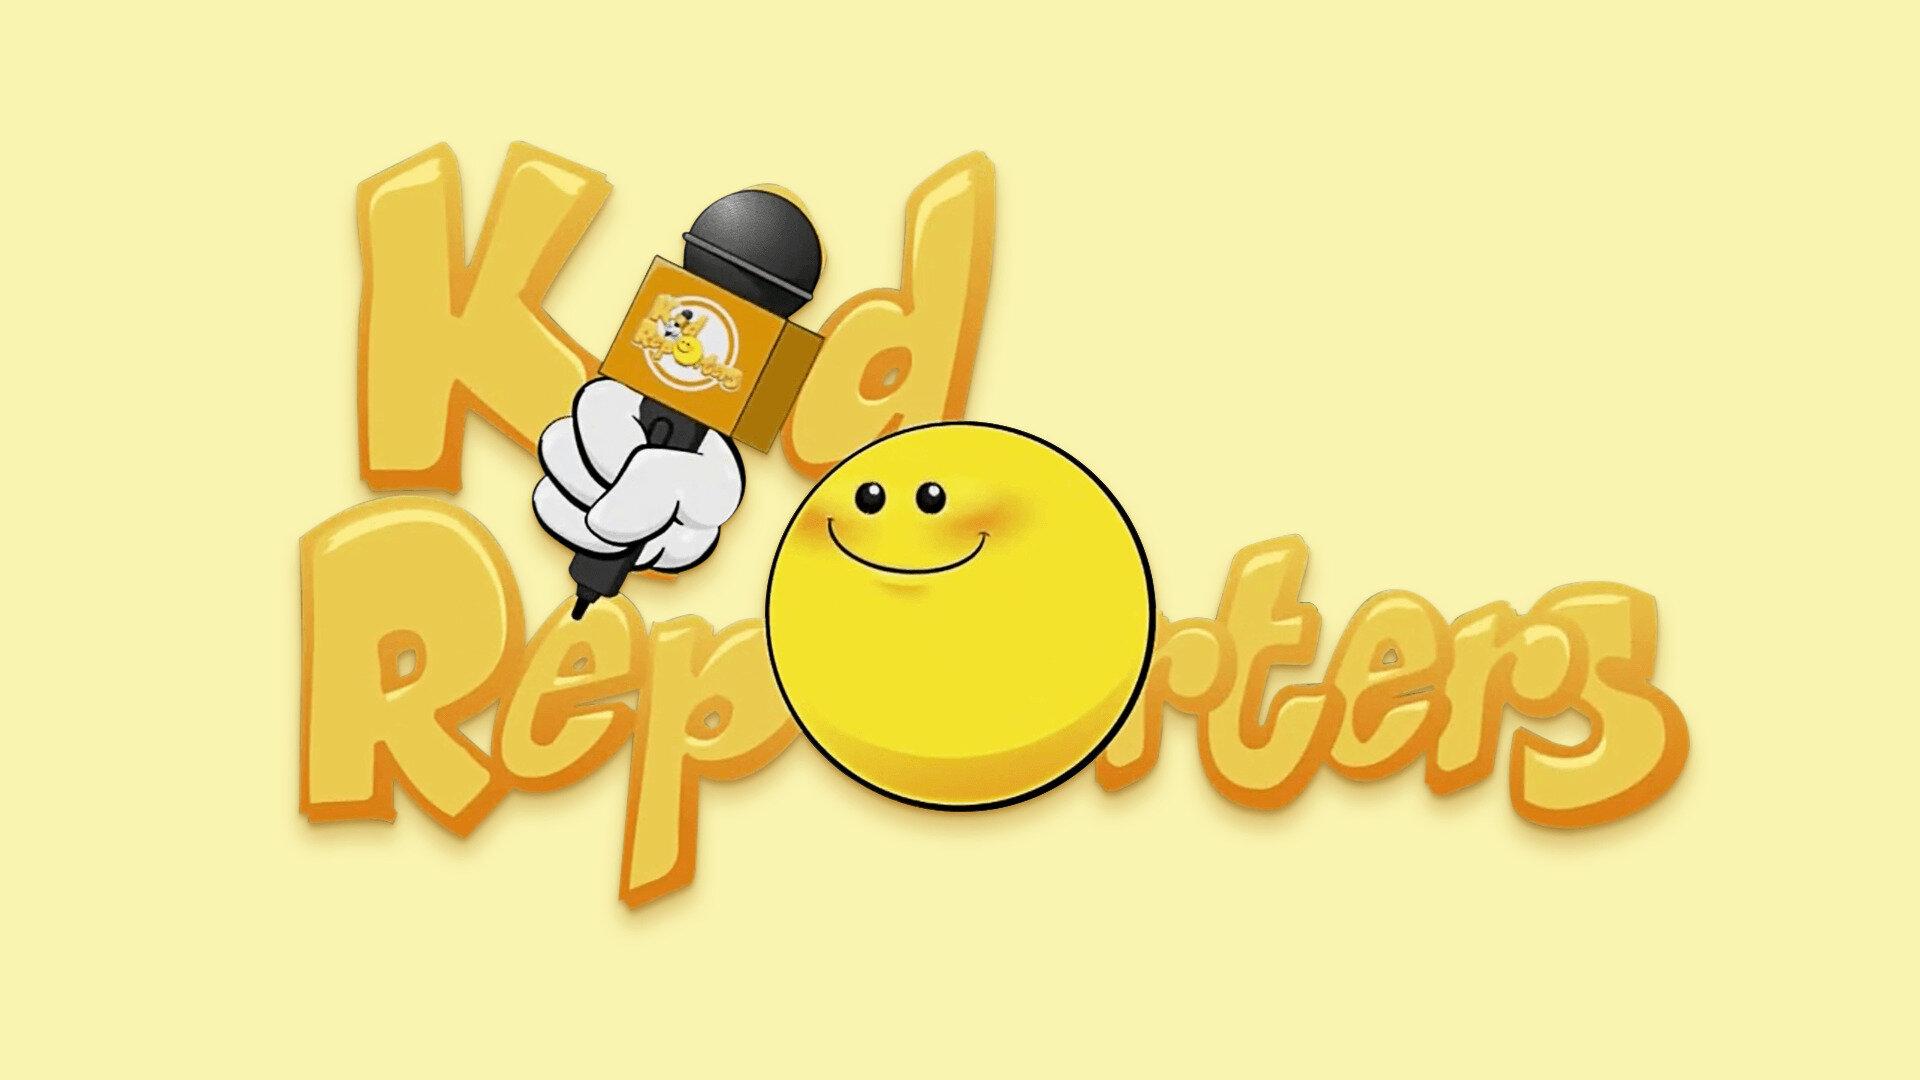 Kid reporters : Premier secours